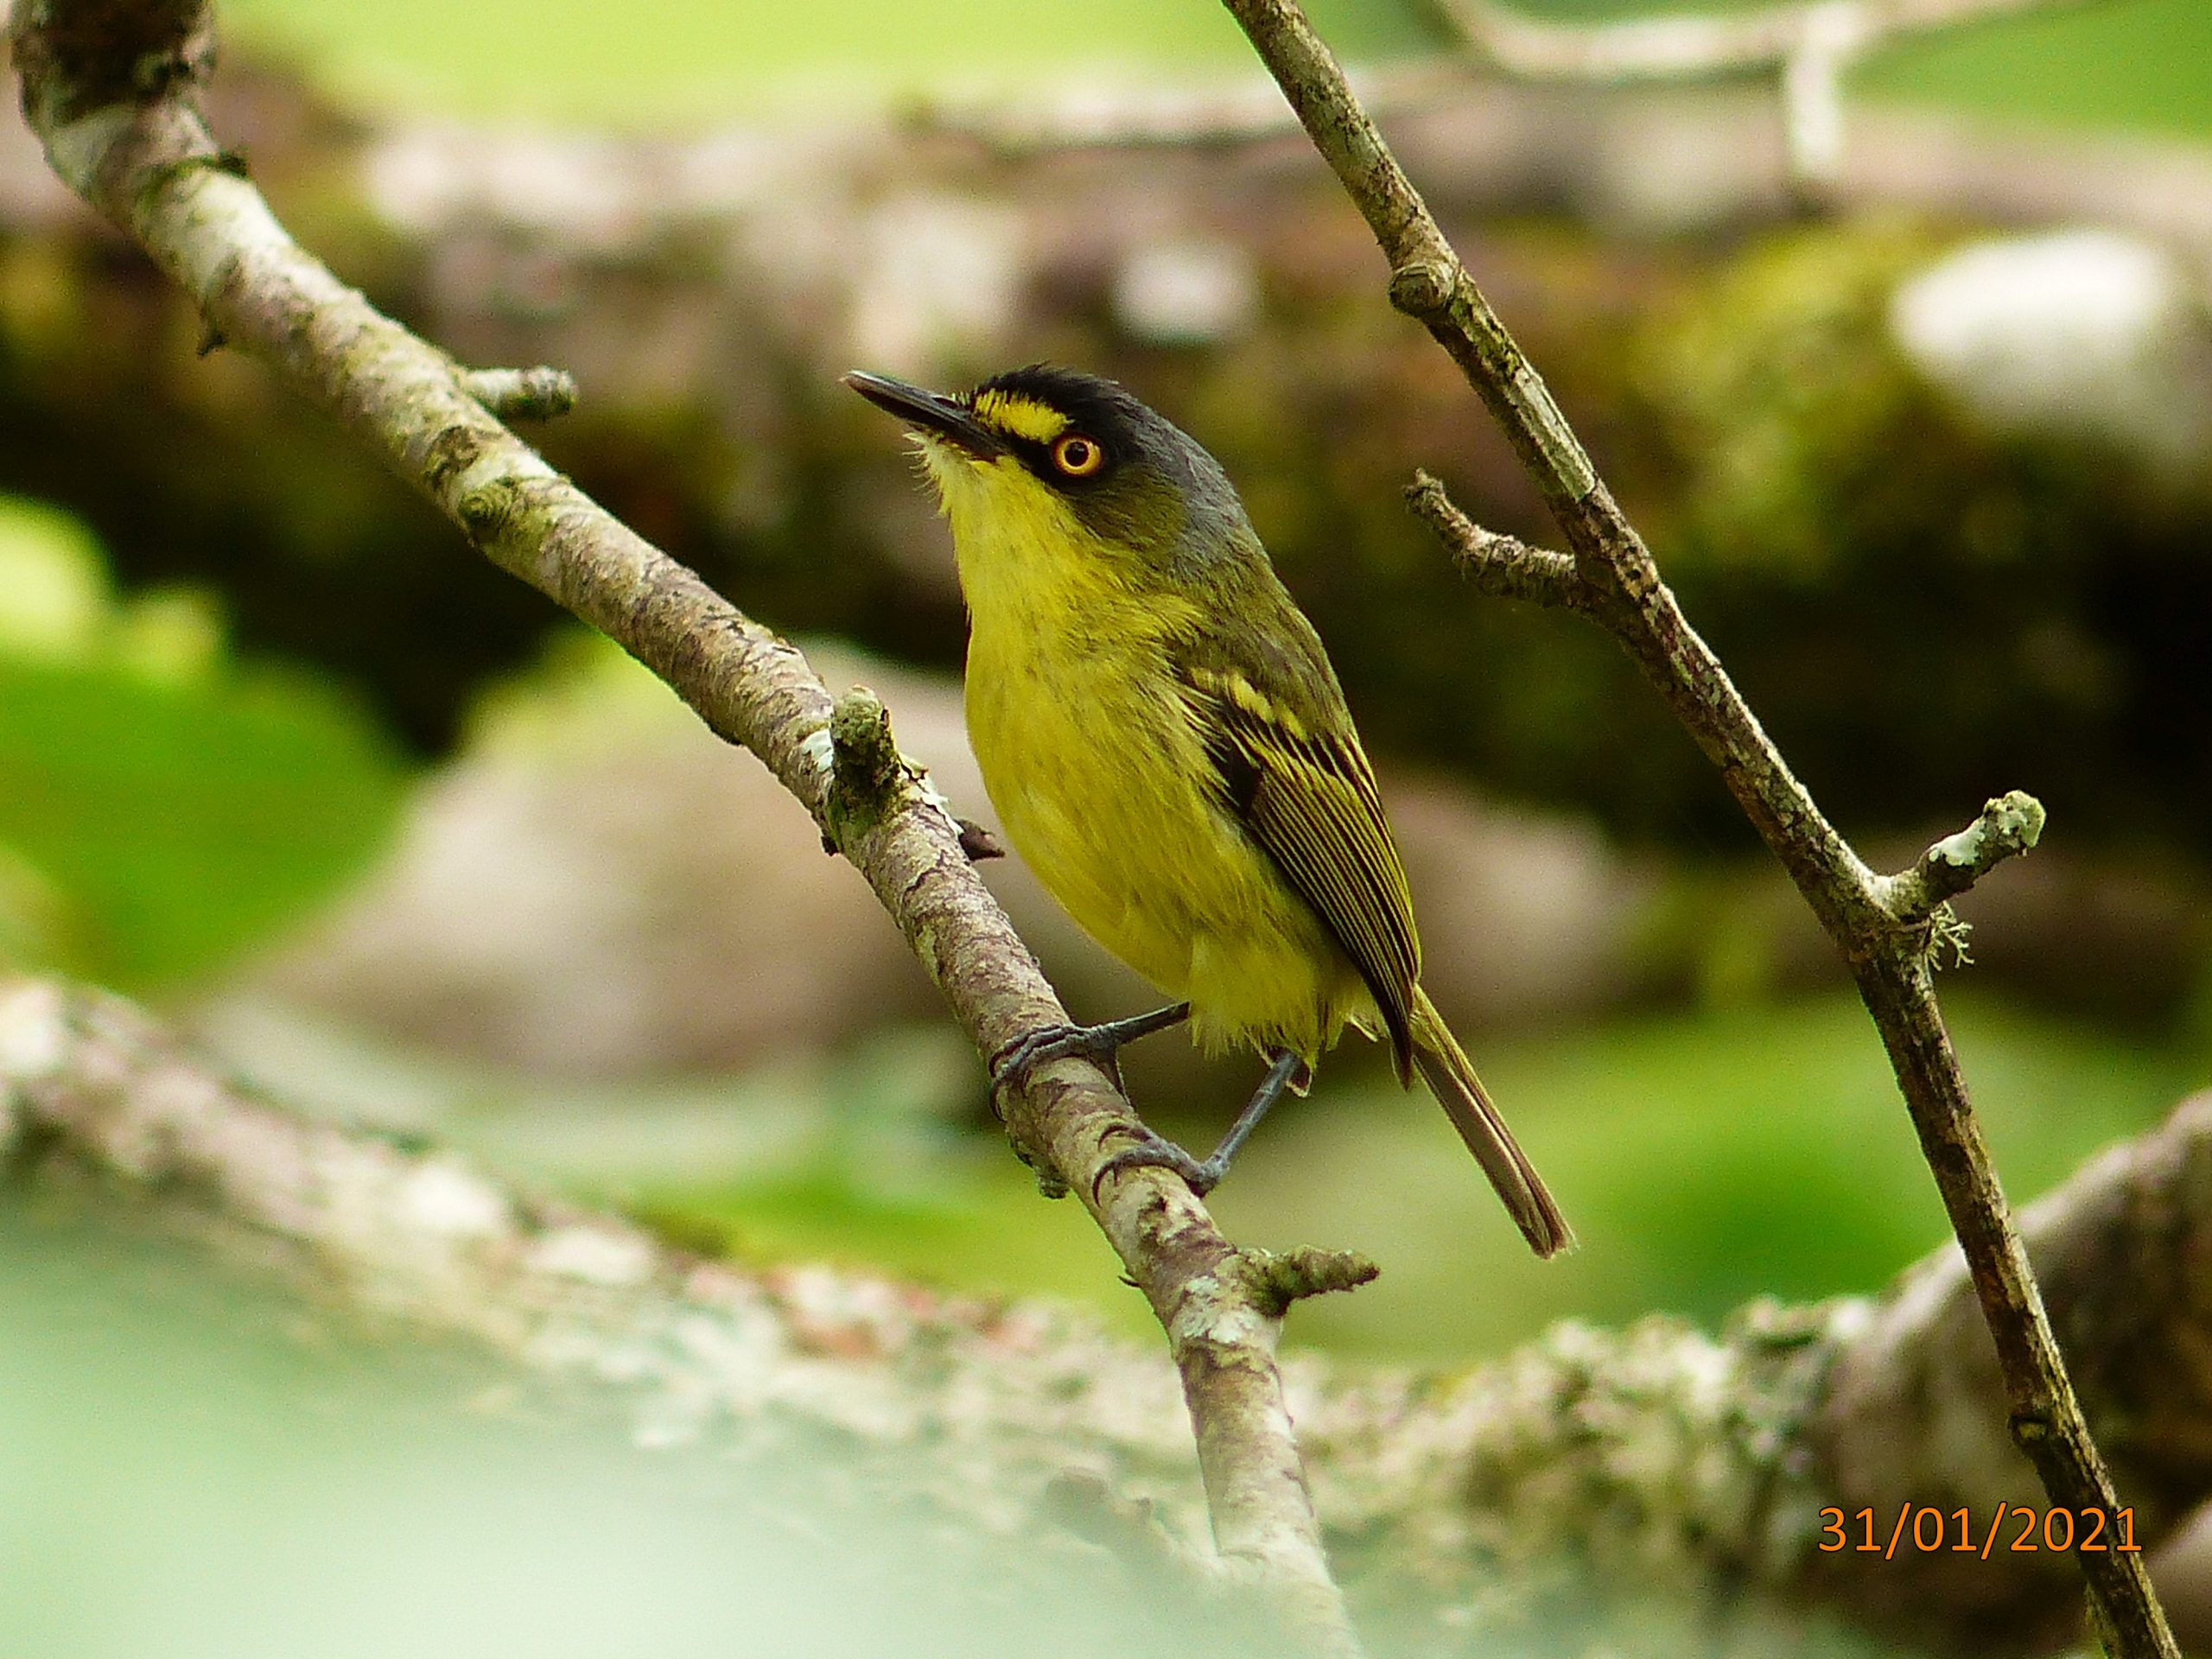 Monitoramento de fauna identifica espécies de aves no Contorno Viário